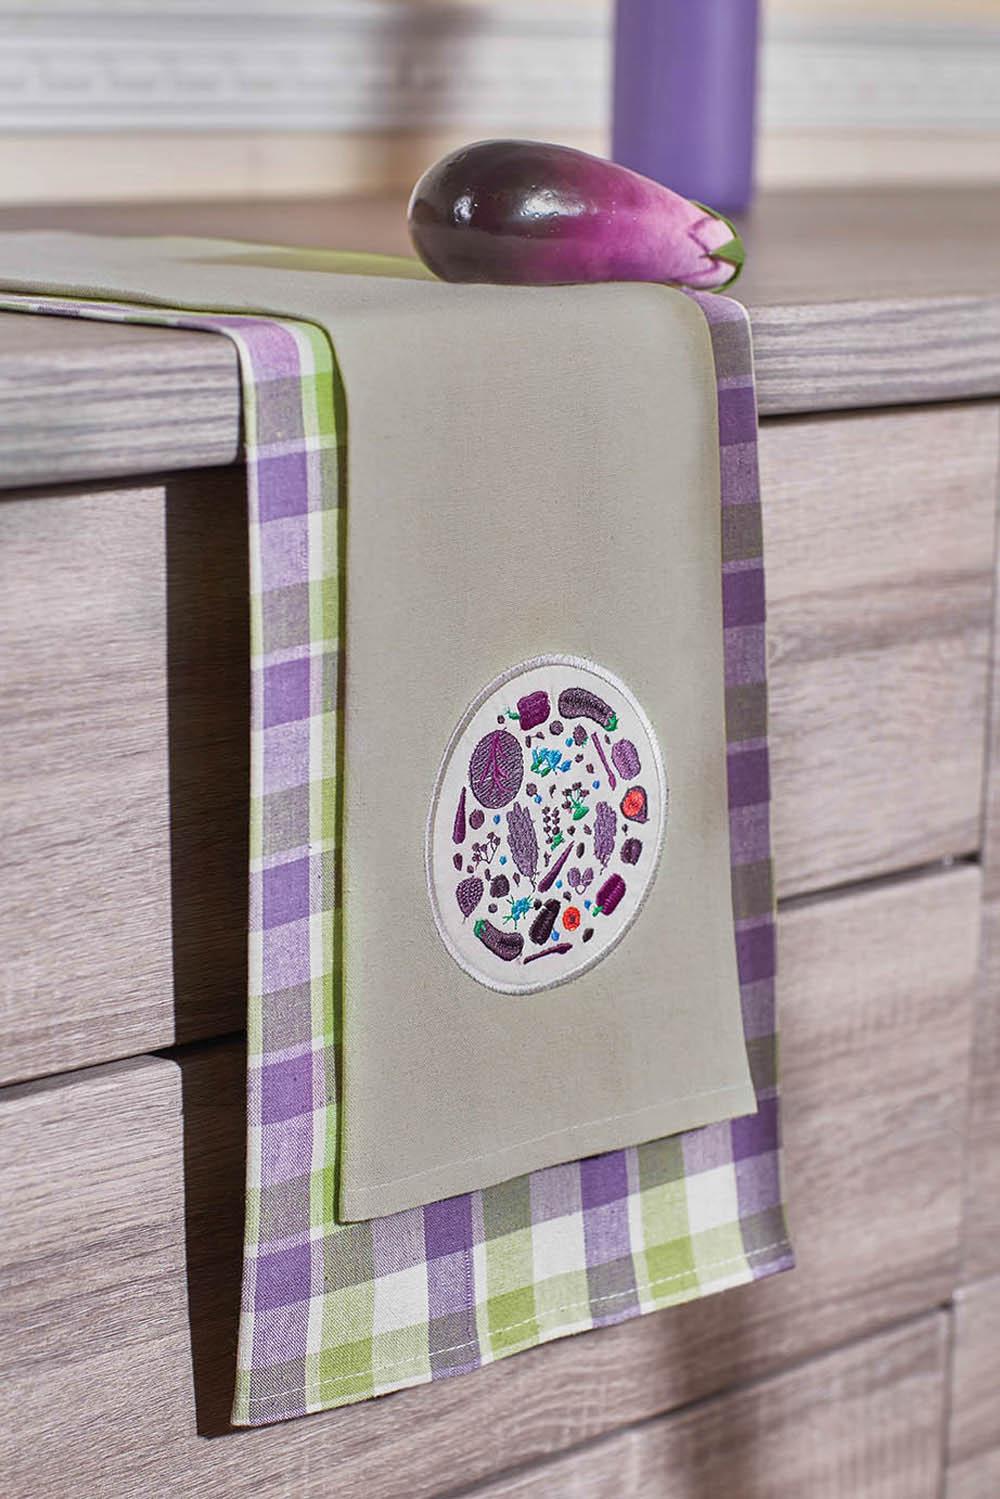 {} Primavelle Кухонное полотенце Floressa Цвет: Фиолетовый (40х60 см - 2 шт) bon appetit кухонное полотенце cake цвет голубой 40х60 см 2 шт